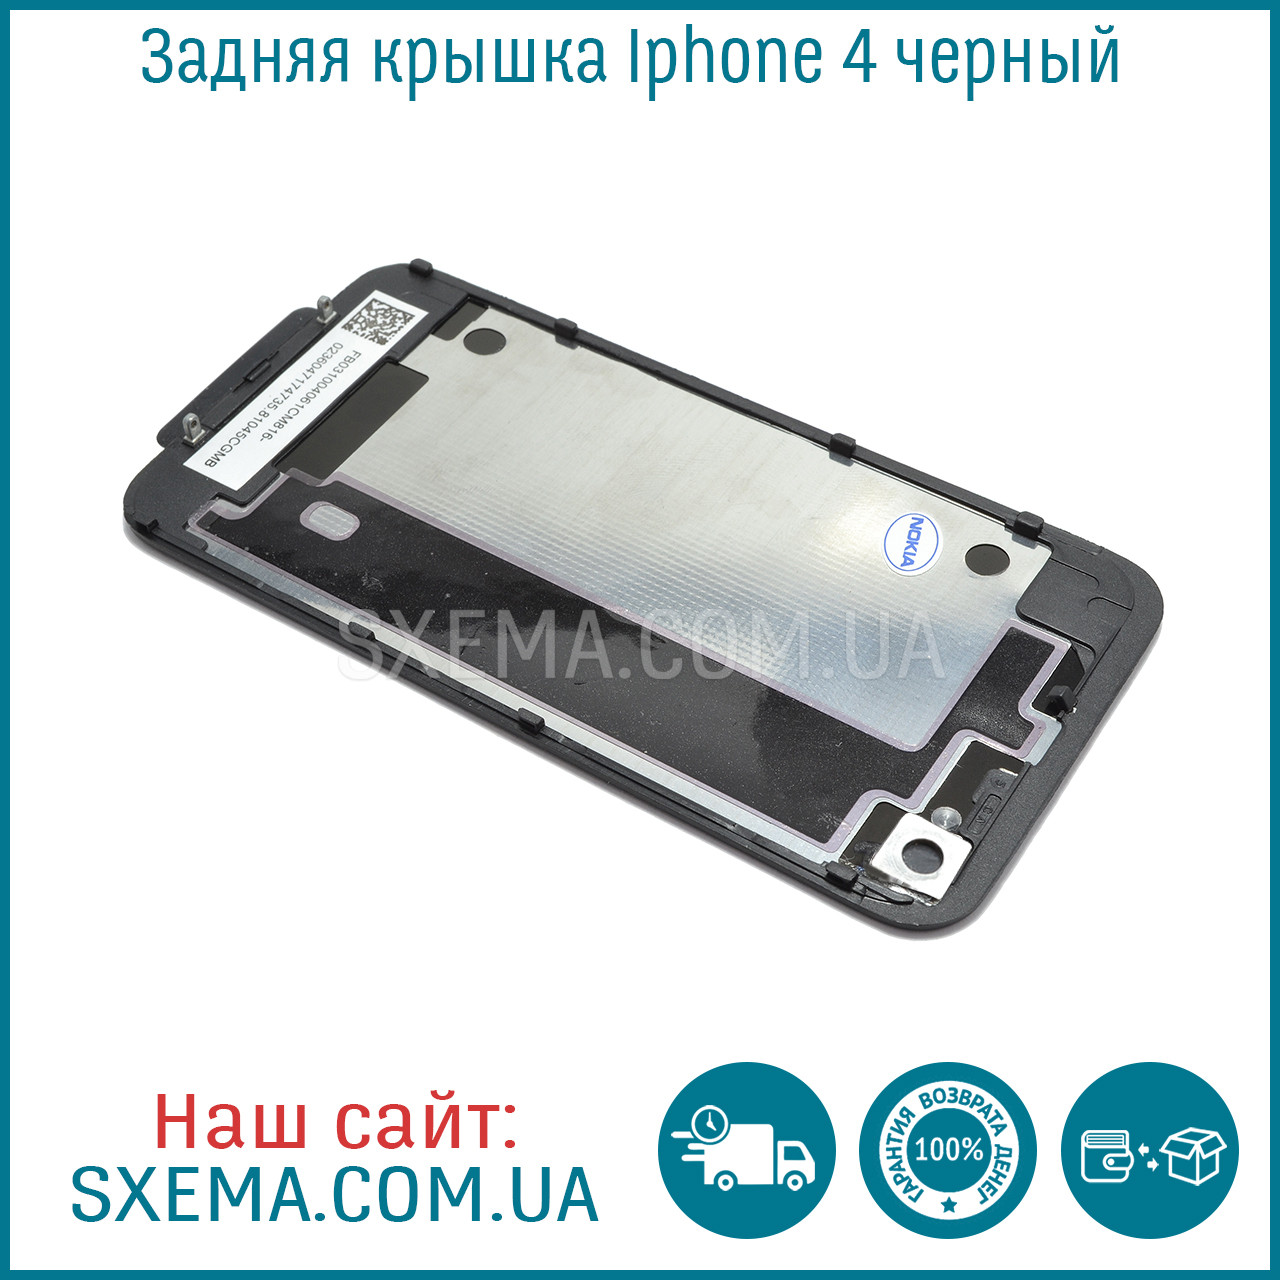 Как разобрать телефон iPhone 4 • Блогофолио Романа Паулова | 1280x1280